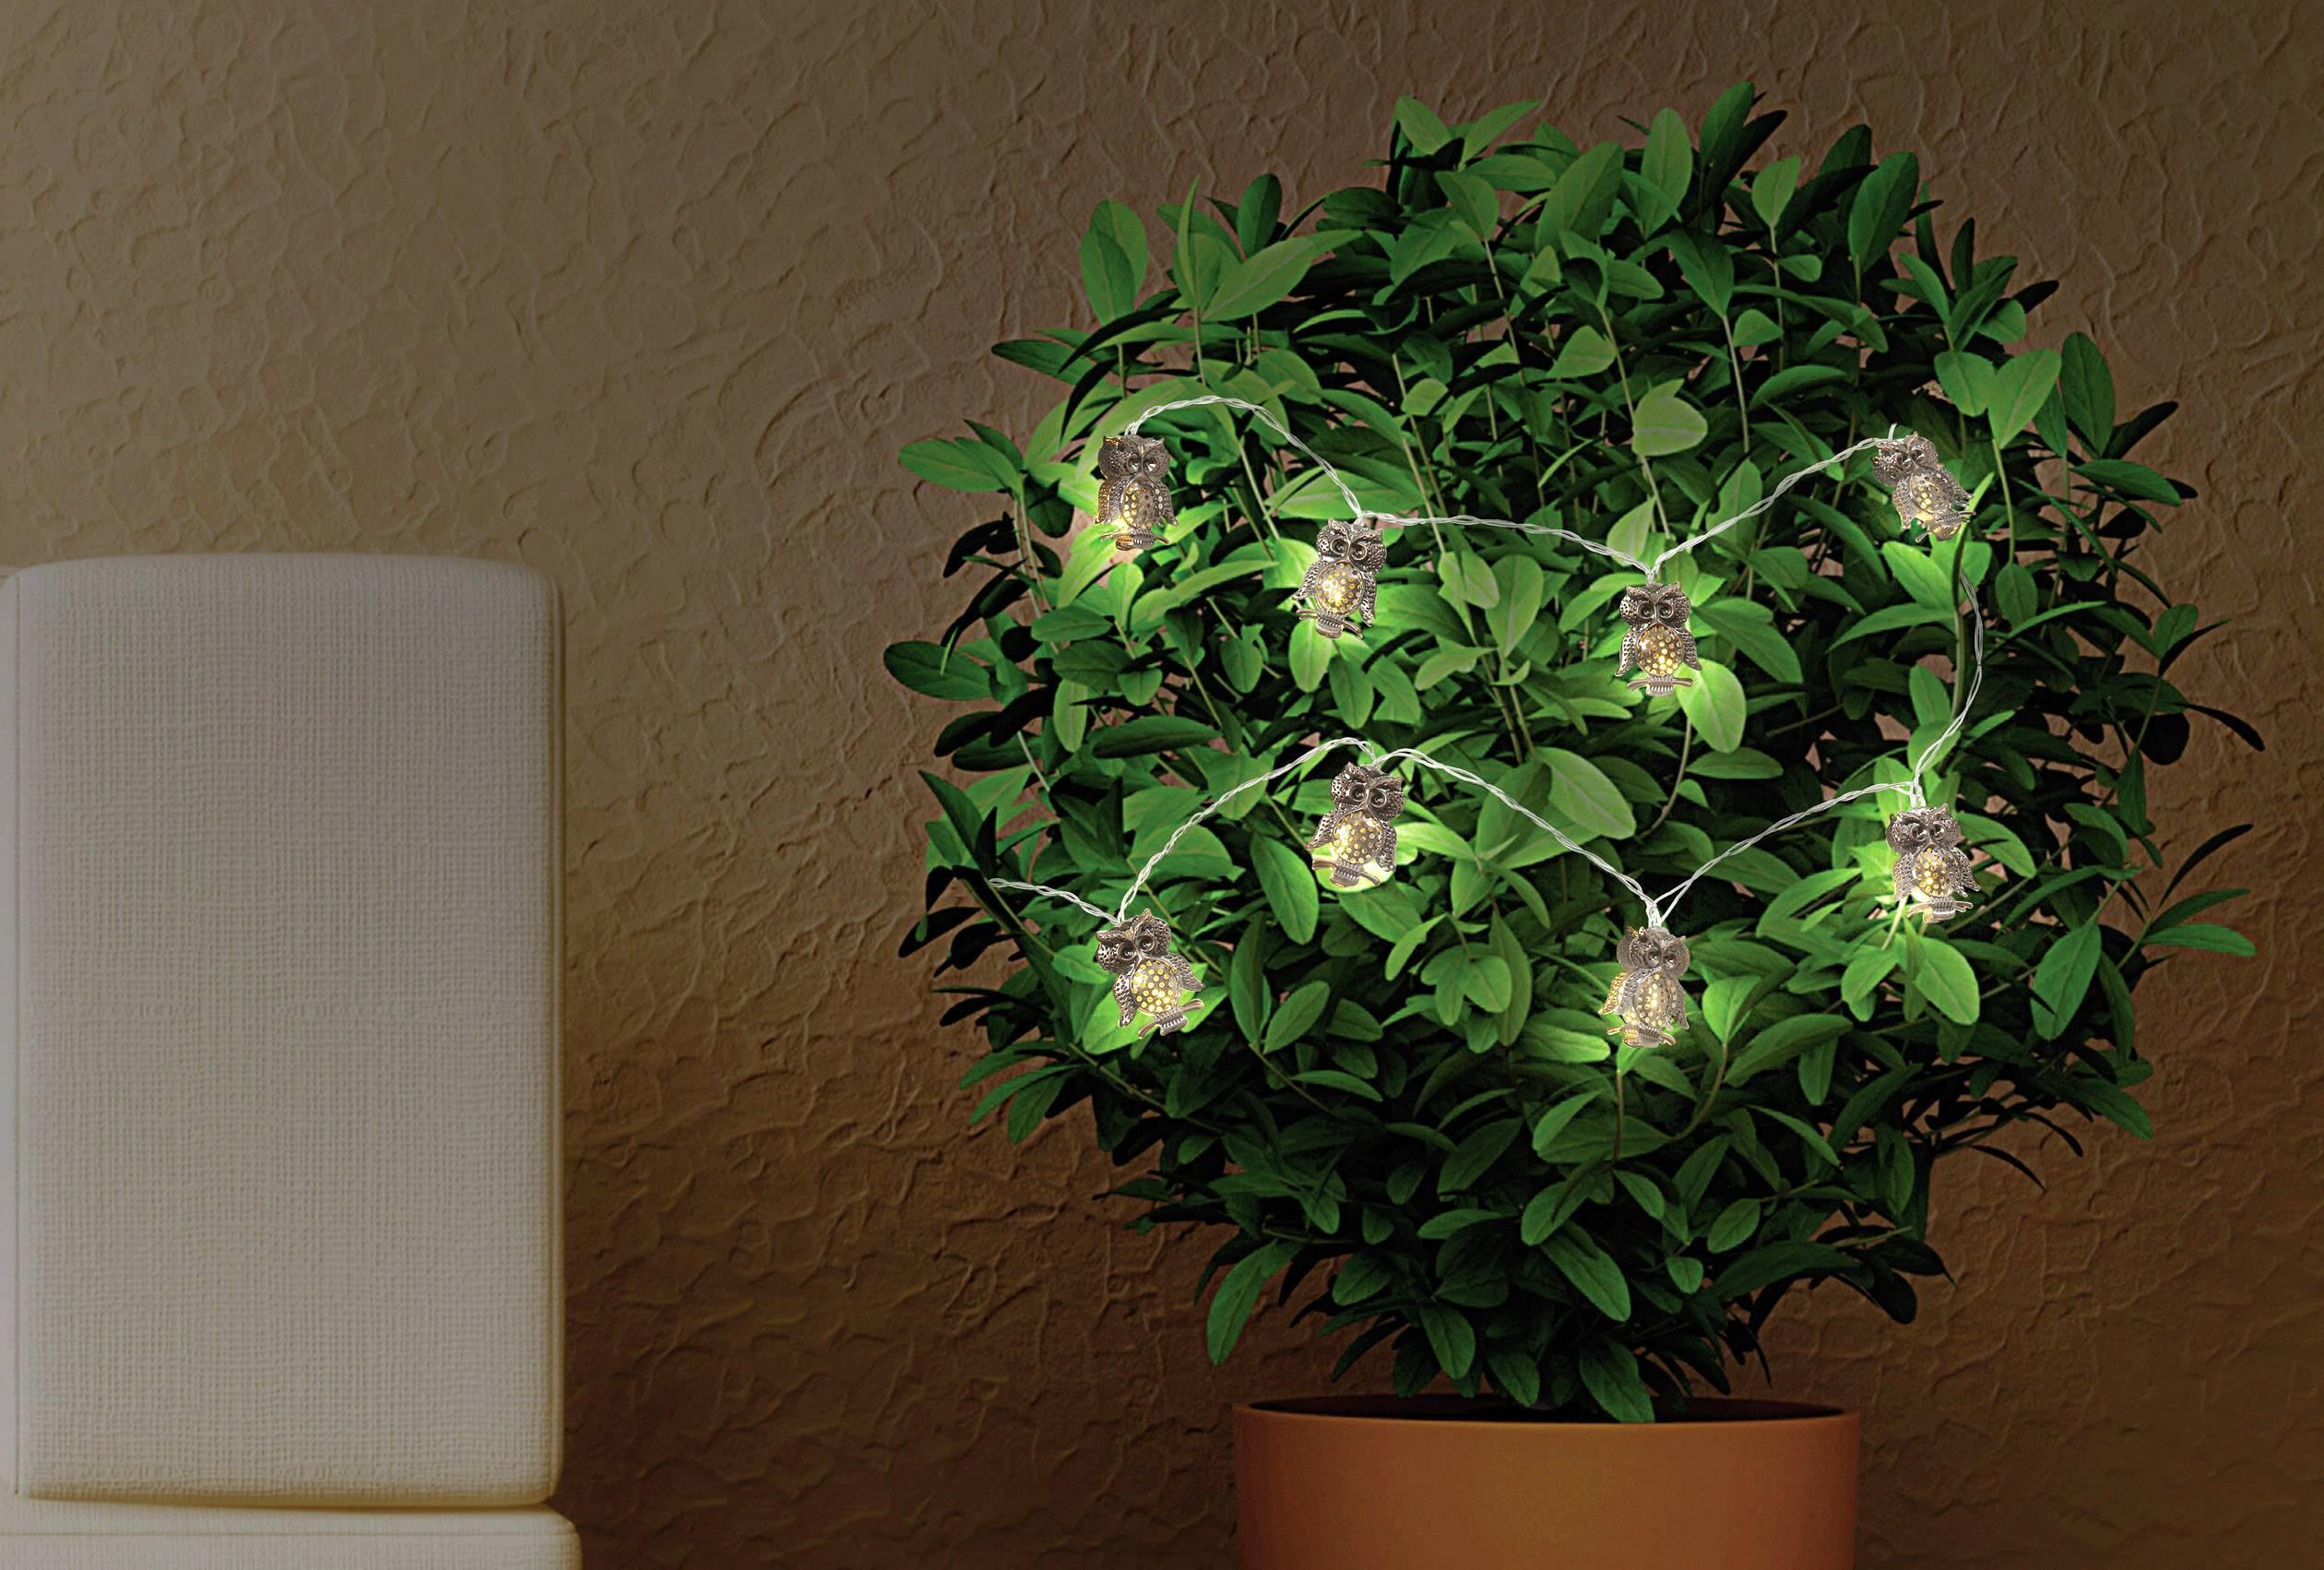 Svetelná LED reťaz so sovami Polarlite, LBA-20-004, 8 LED, 155 cm